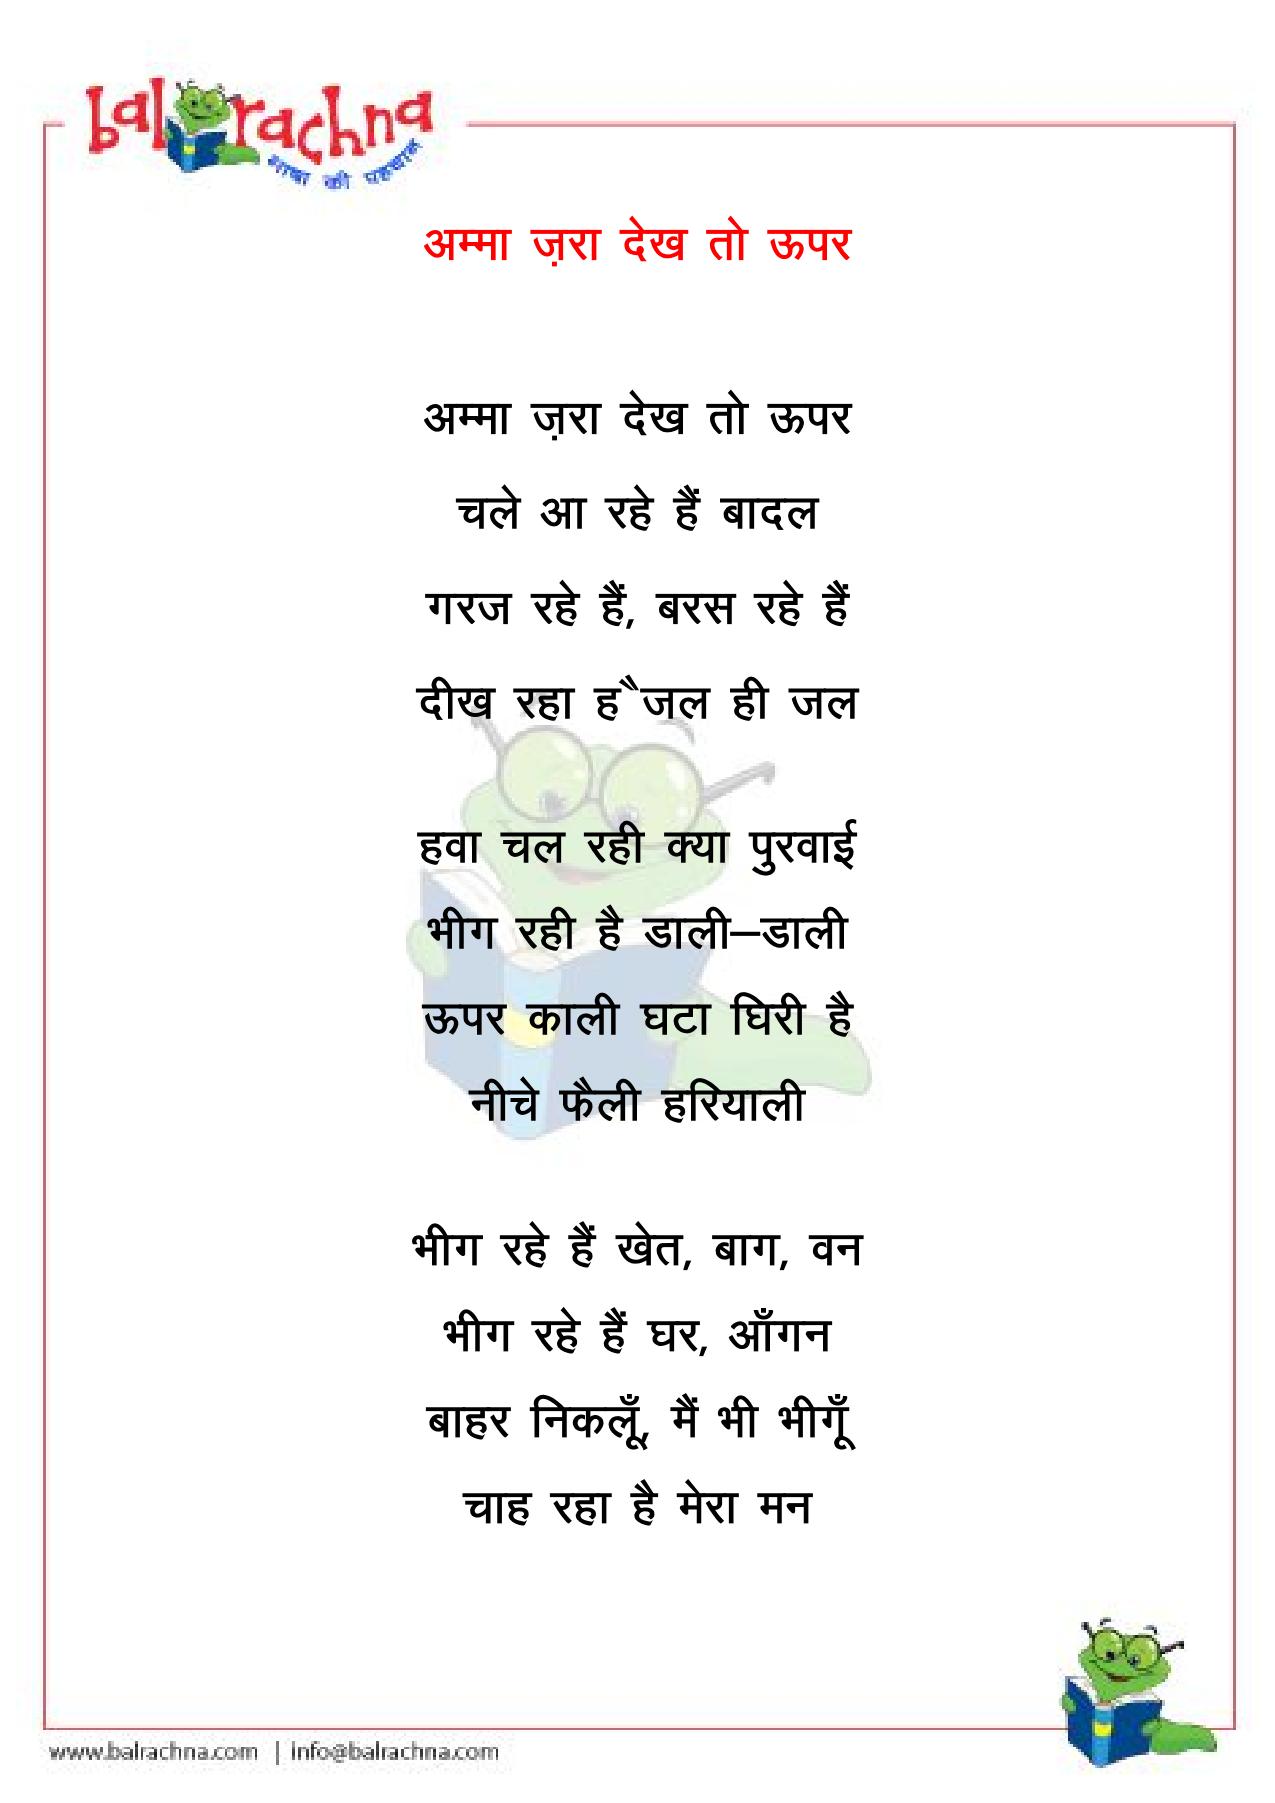 Pin By Rachna Maheshwari On Rachna Maheshwari Hindi Poems For Kids Hindi Poems For Kids Hindi Language Learning Kids Poems [ 1803 x 1275 Pixel ]